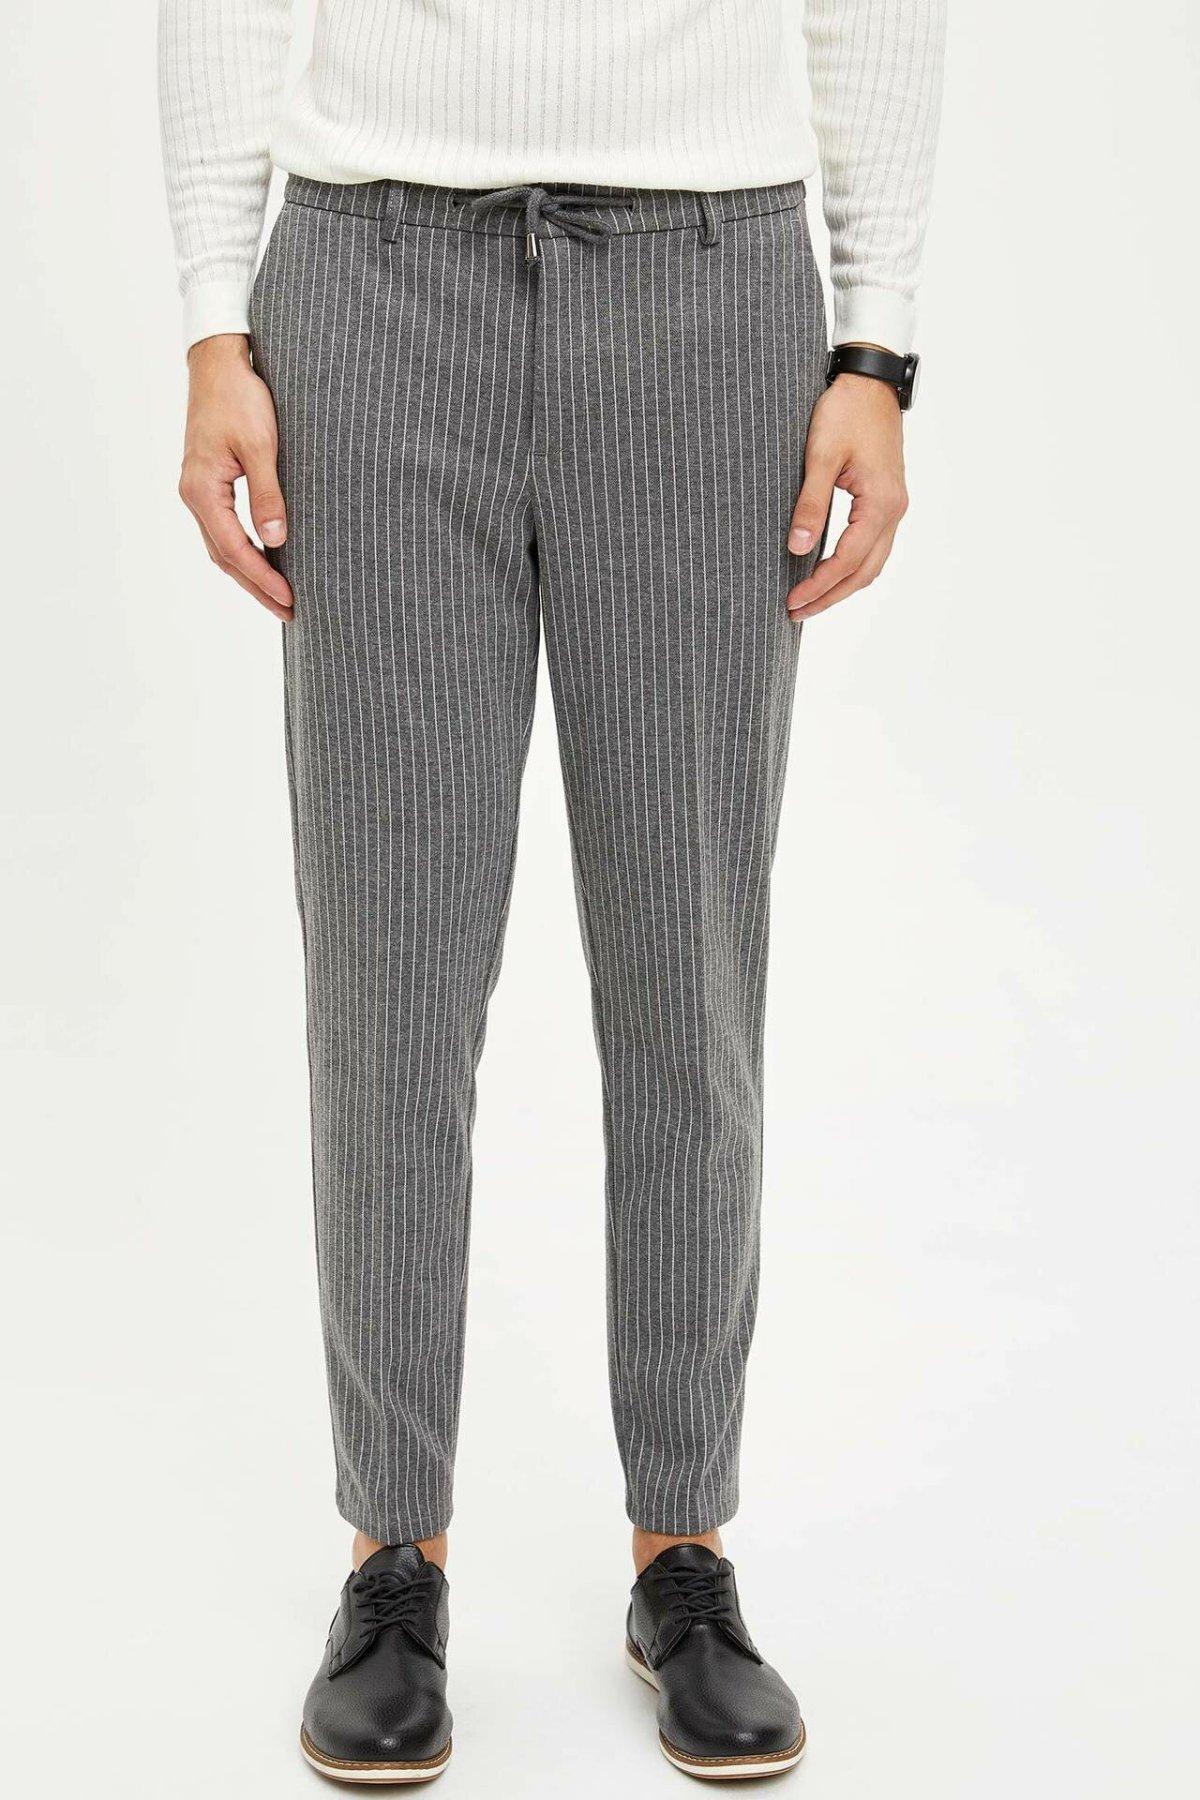 DeFacto Man Formal Drawstring Trousers Casual Striped Straight Loose Pants For Men's High Quality Long Pants Men - L6655AZ19AU